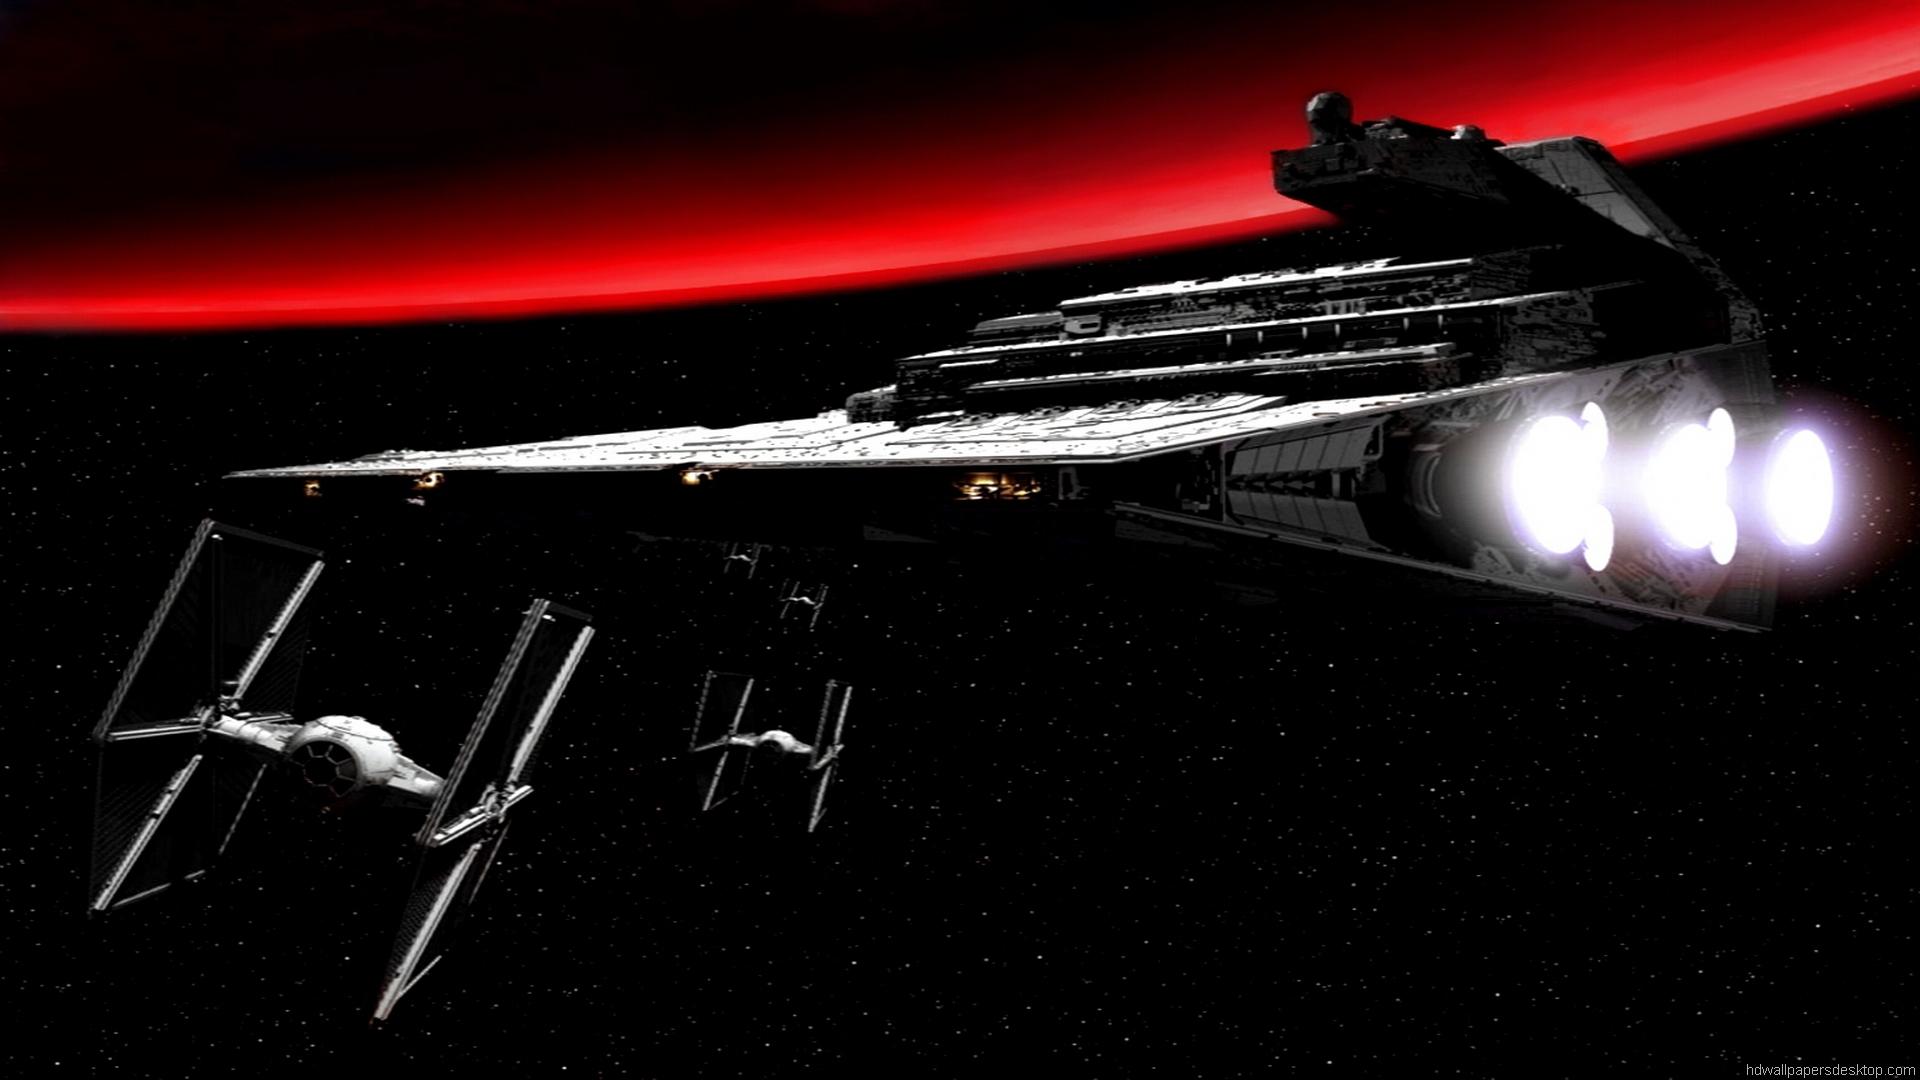 Star Wars Full HD Wallpaper 1080p Desktop star wars empire 1920x1080